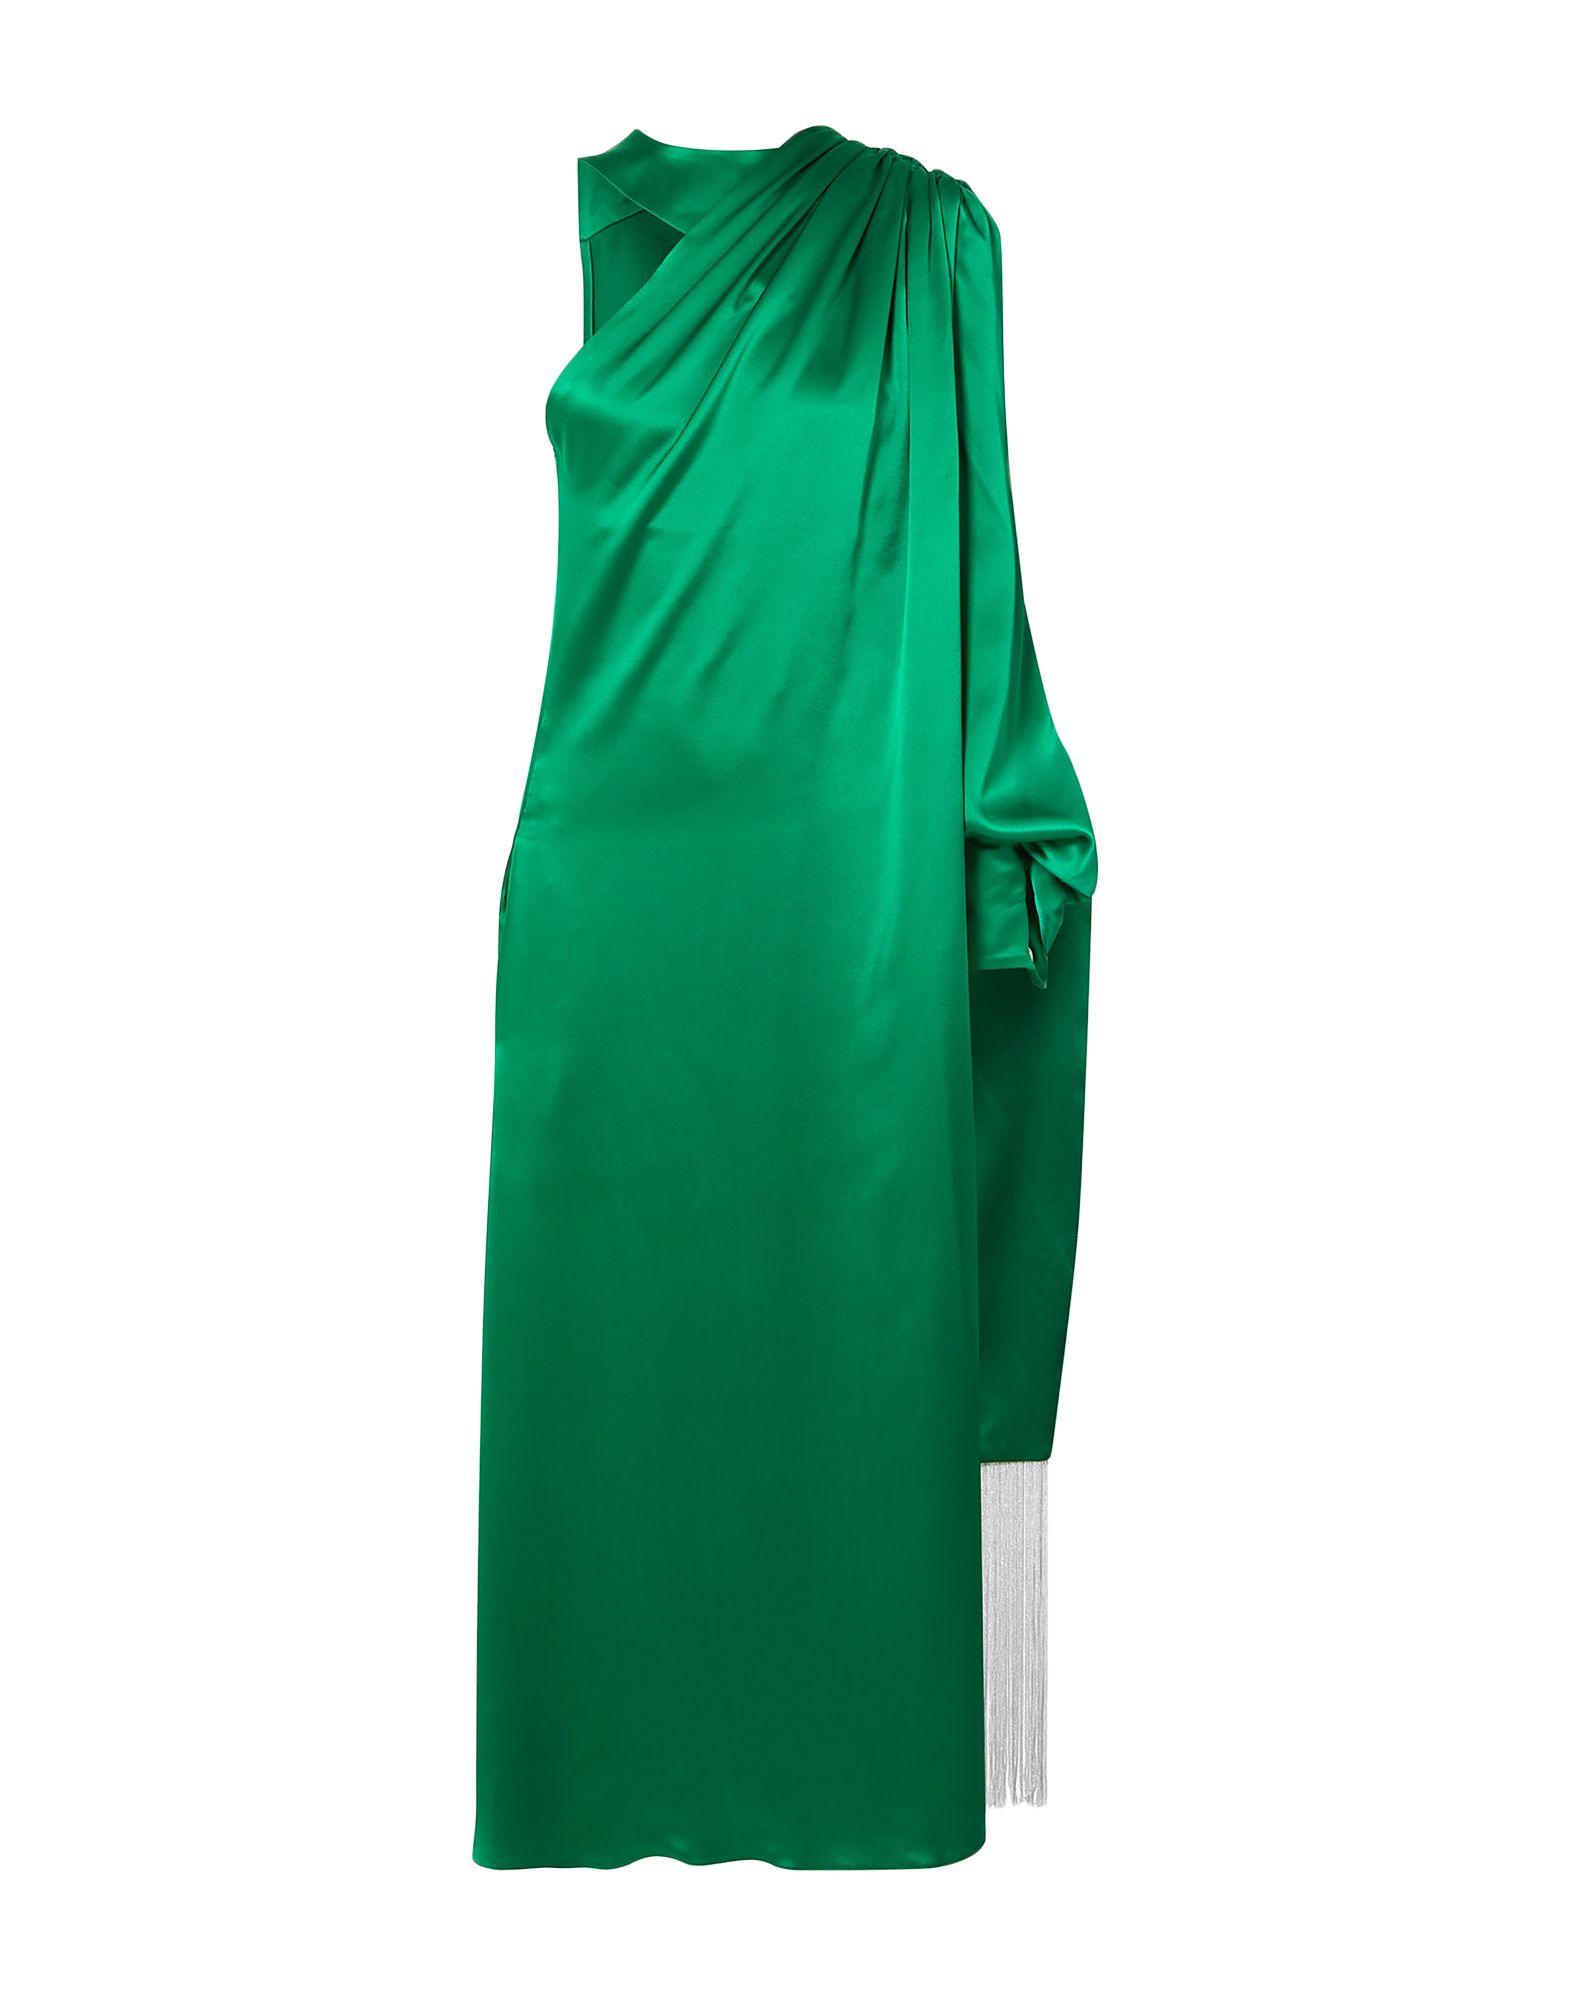 Фото - HILLIER BARTLEY Платье длиной 3/4 hillier bartley длинное платье